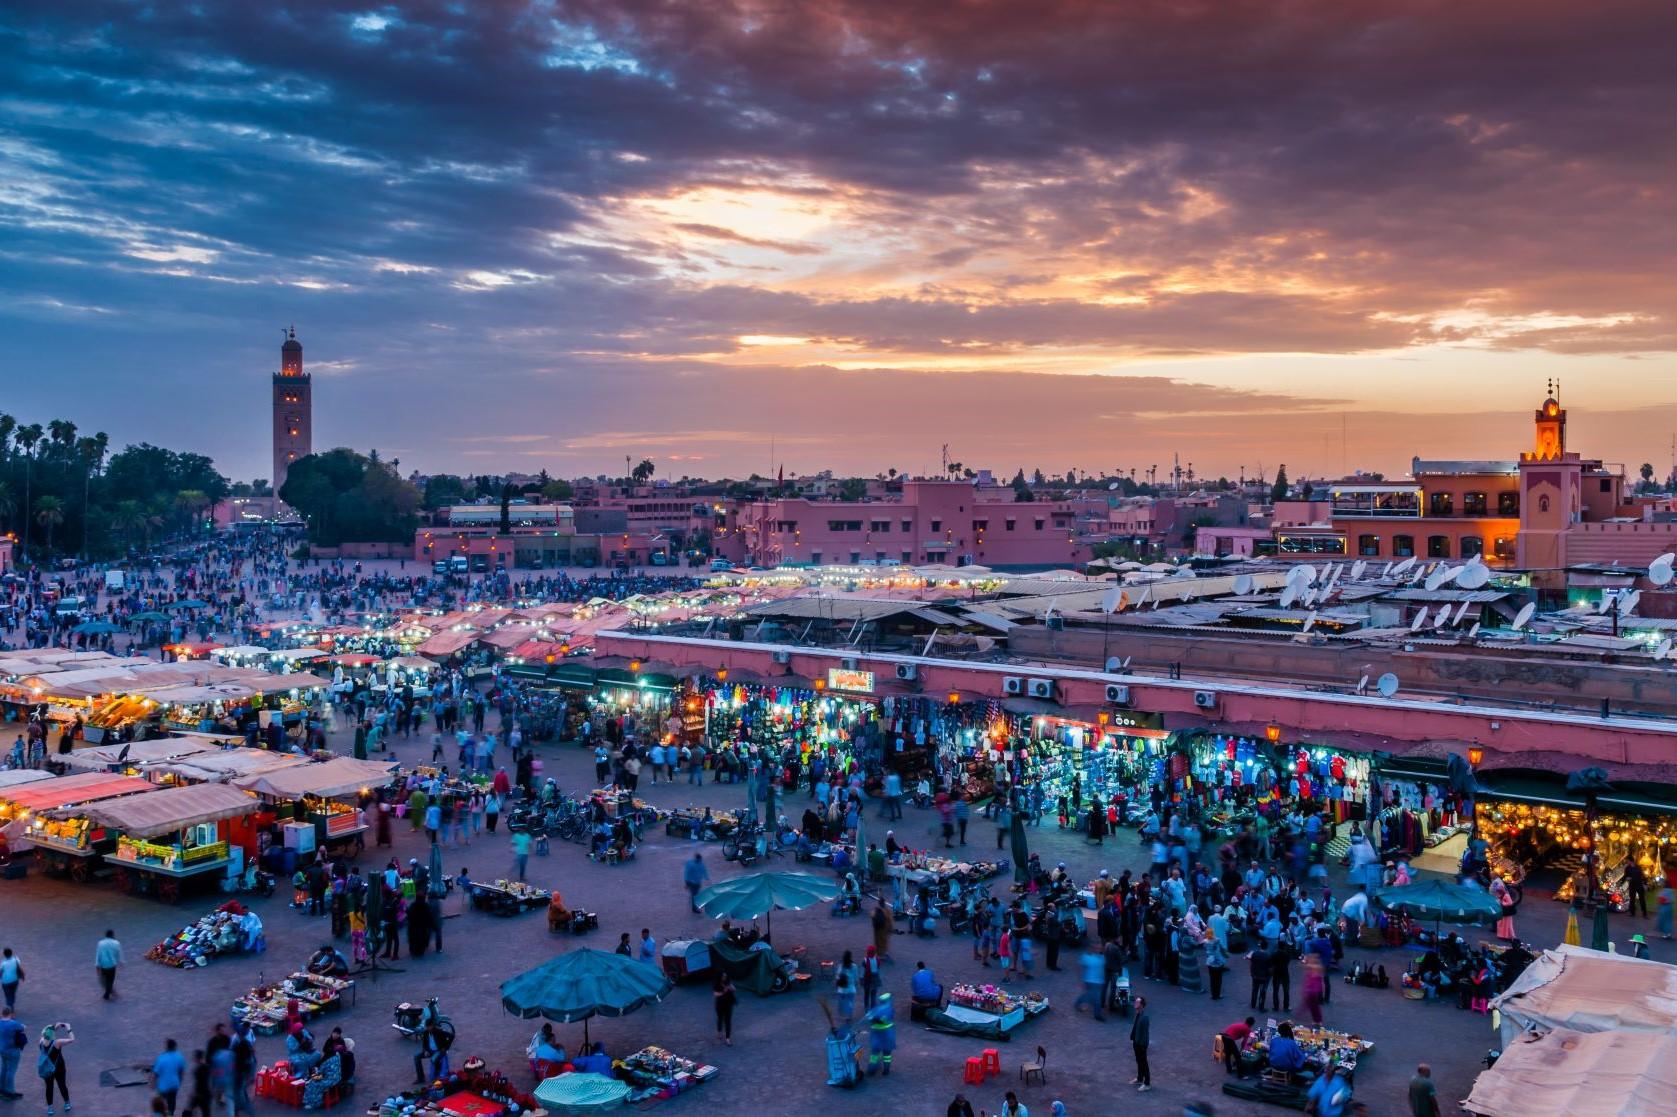 Marrakech. Lujo gastronómico. Nuba everywhere. Plaza